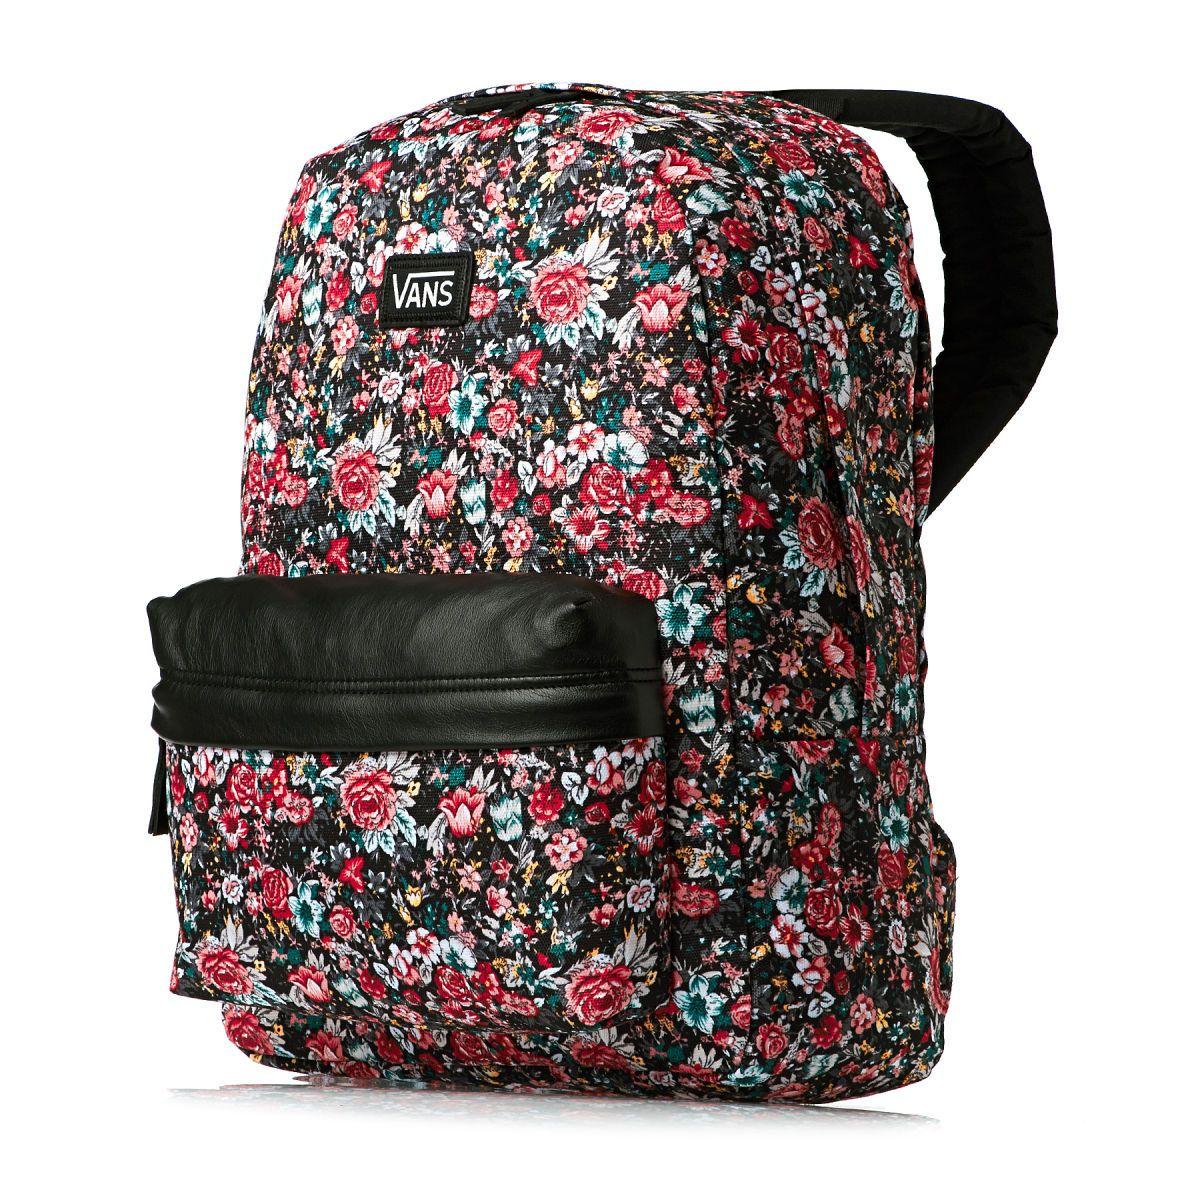 vans old skool ii backpack rucksack 42 cm 22 liters. Black Bedroom Furniture Sets. Home Design Ideas